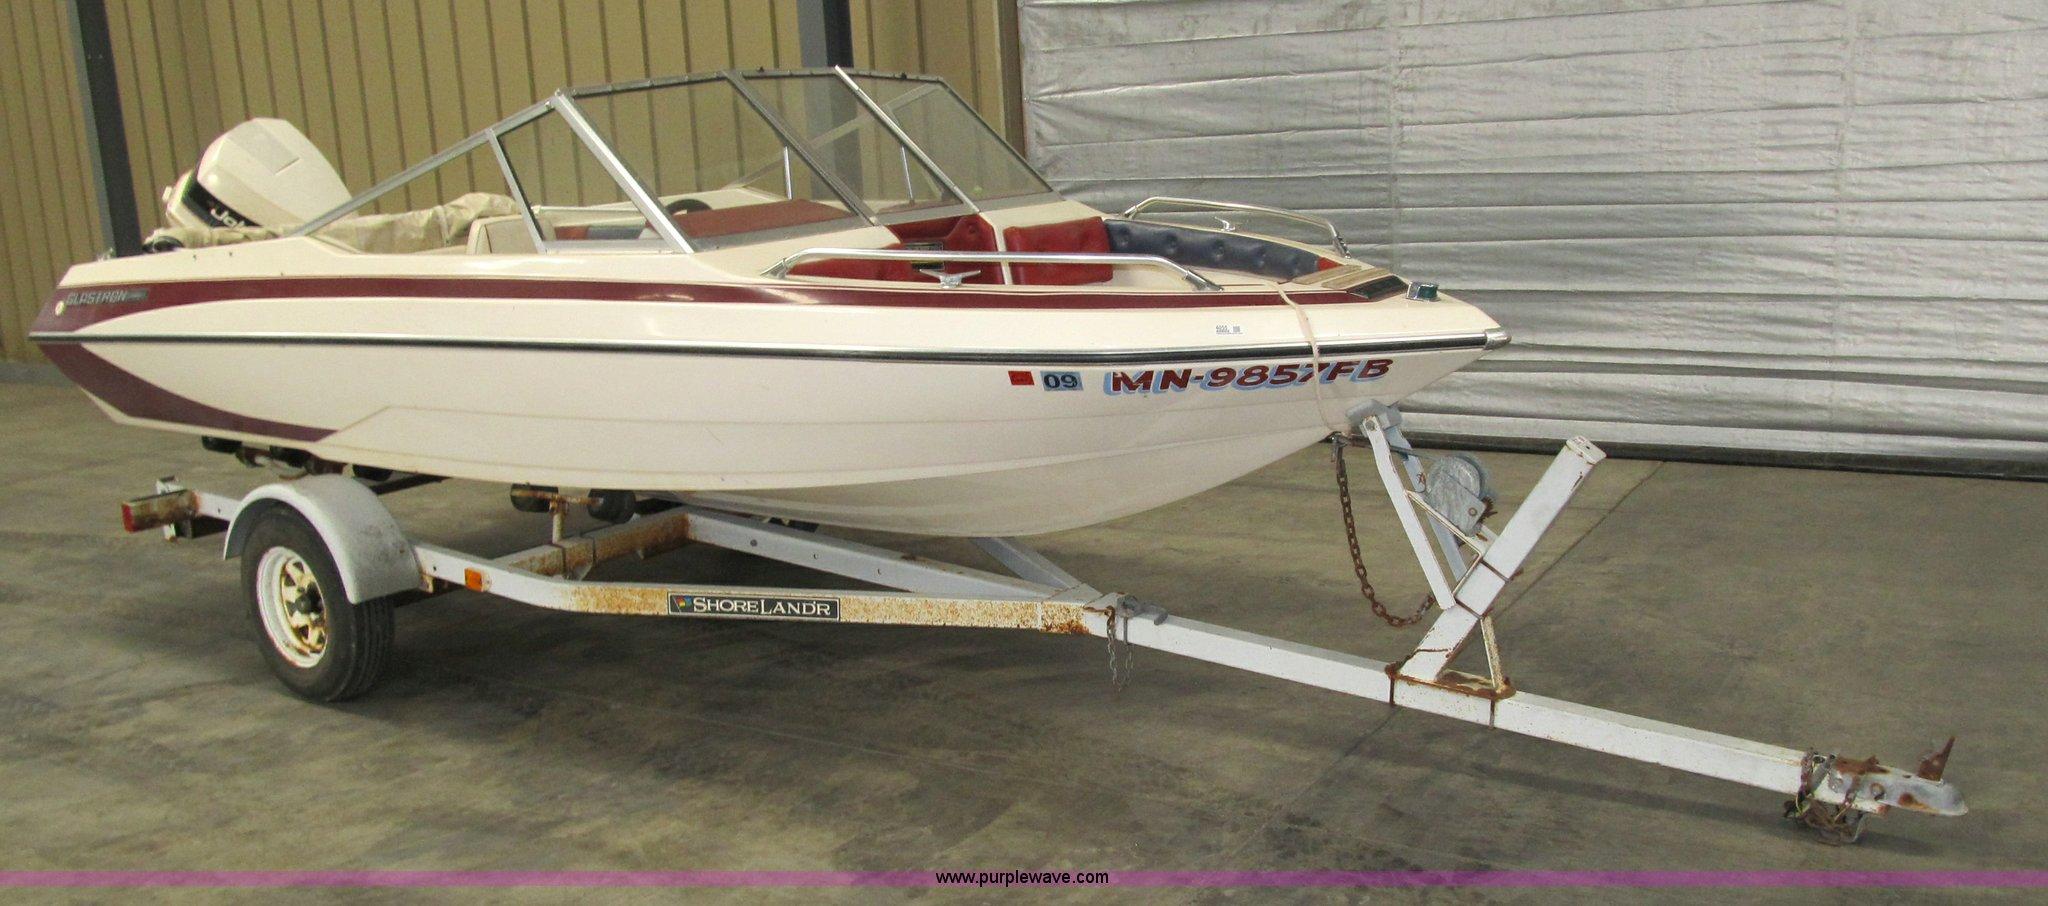 Glastron Conroy X 19 Wiring Diagram 1988 Country Coach 12v 1986 Boat Item 4055 Sold Wednesday Marc Carlson Cvx 20